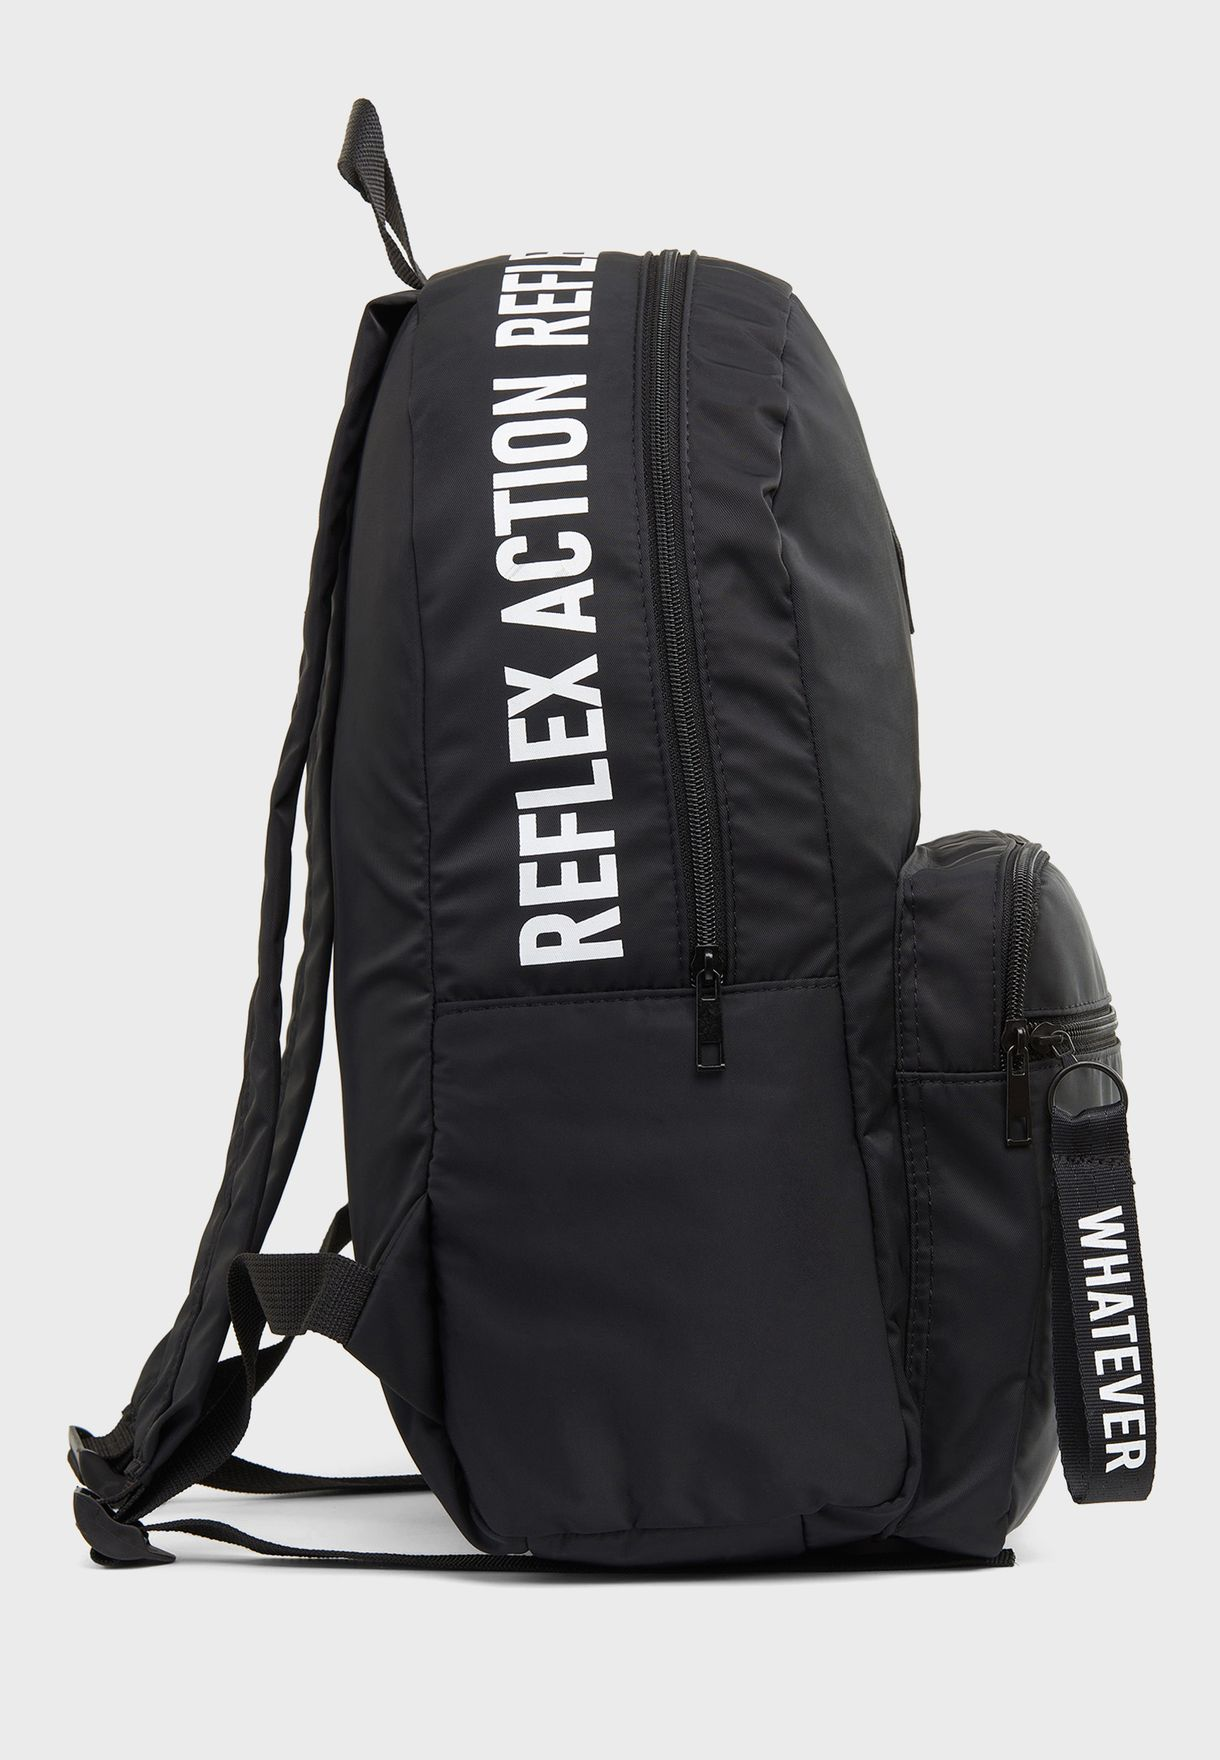 Whatever Backpack